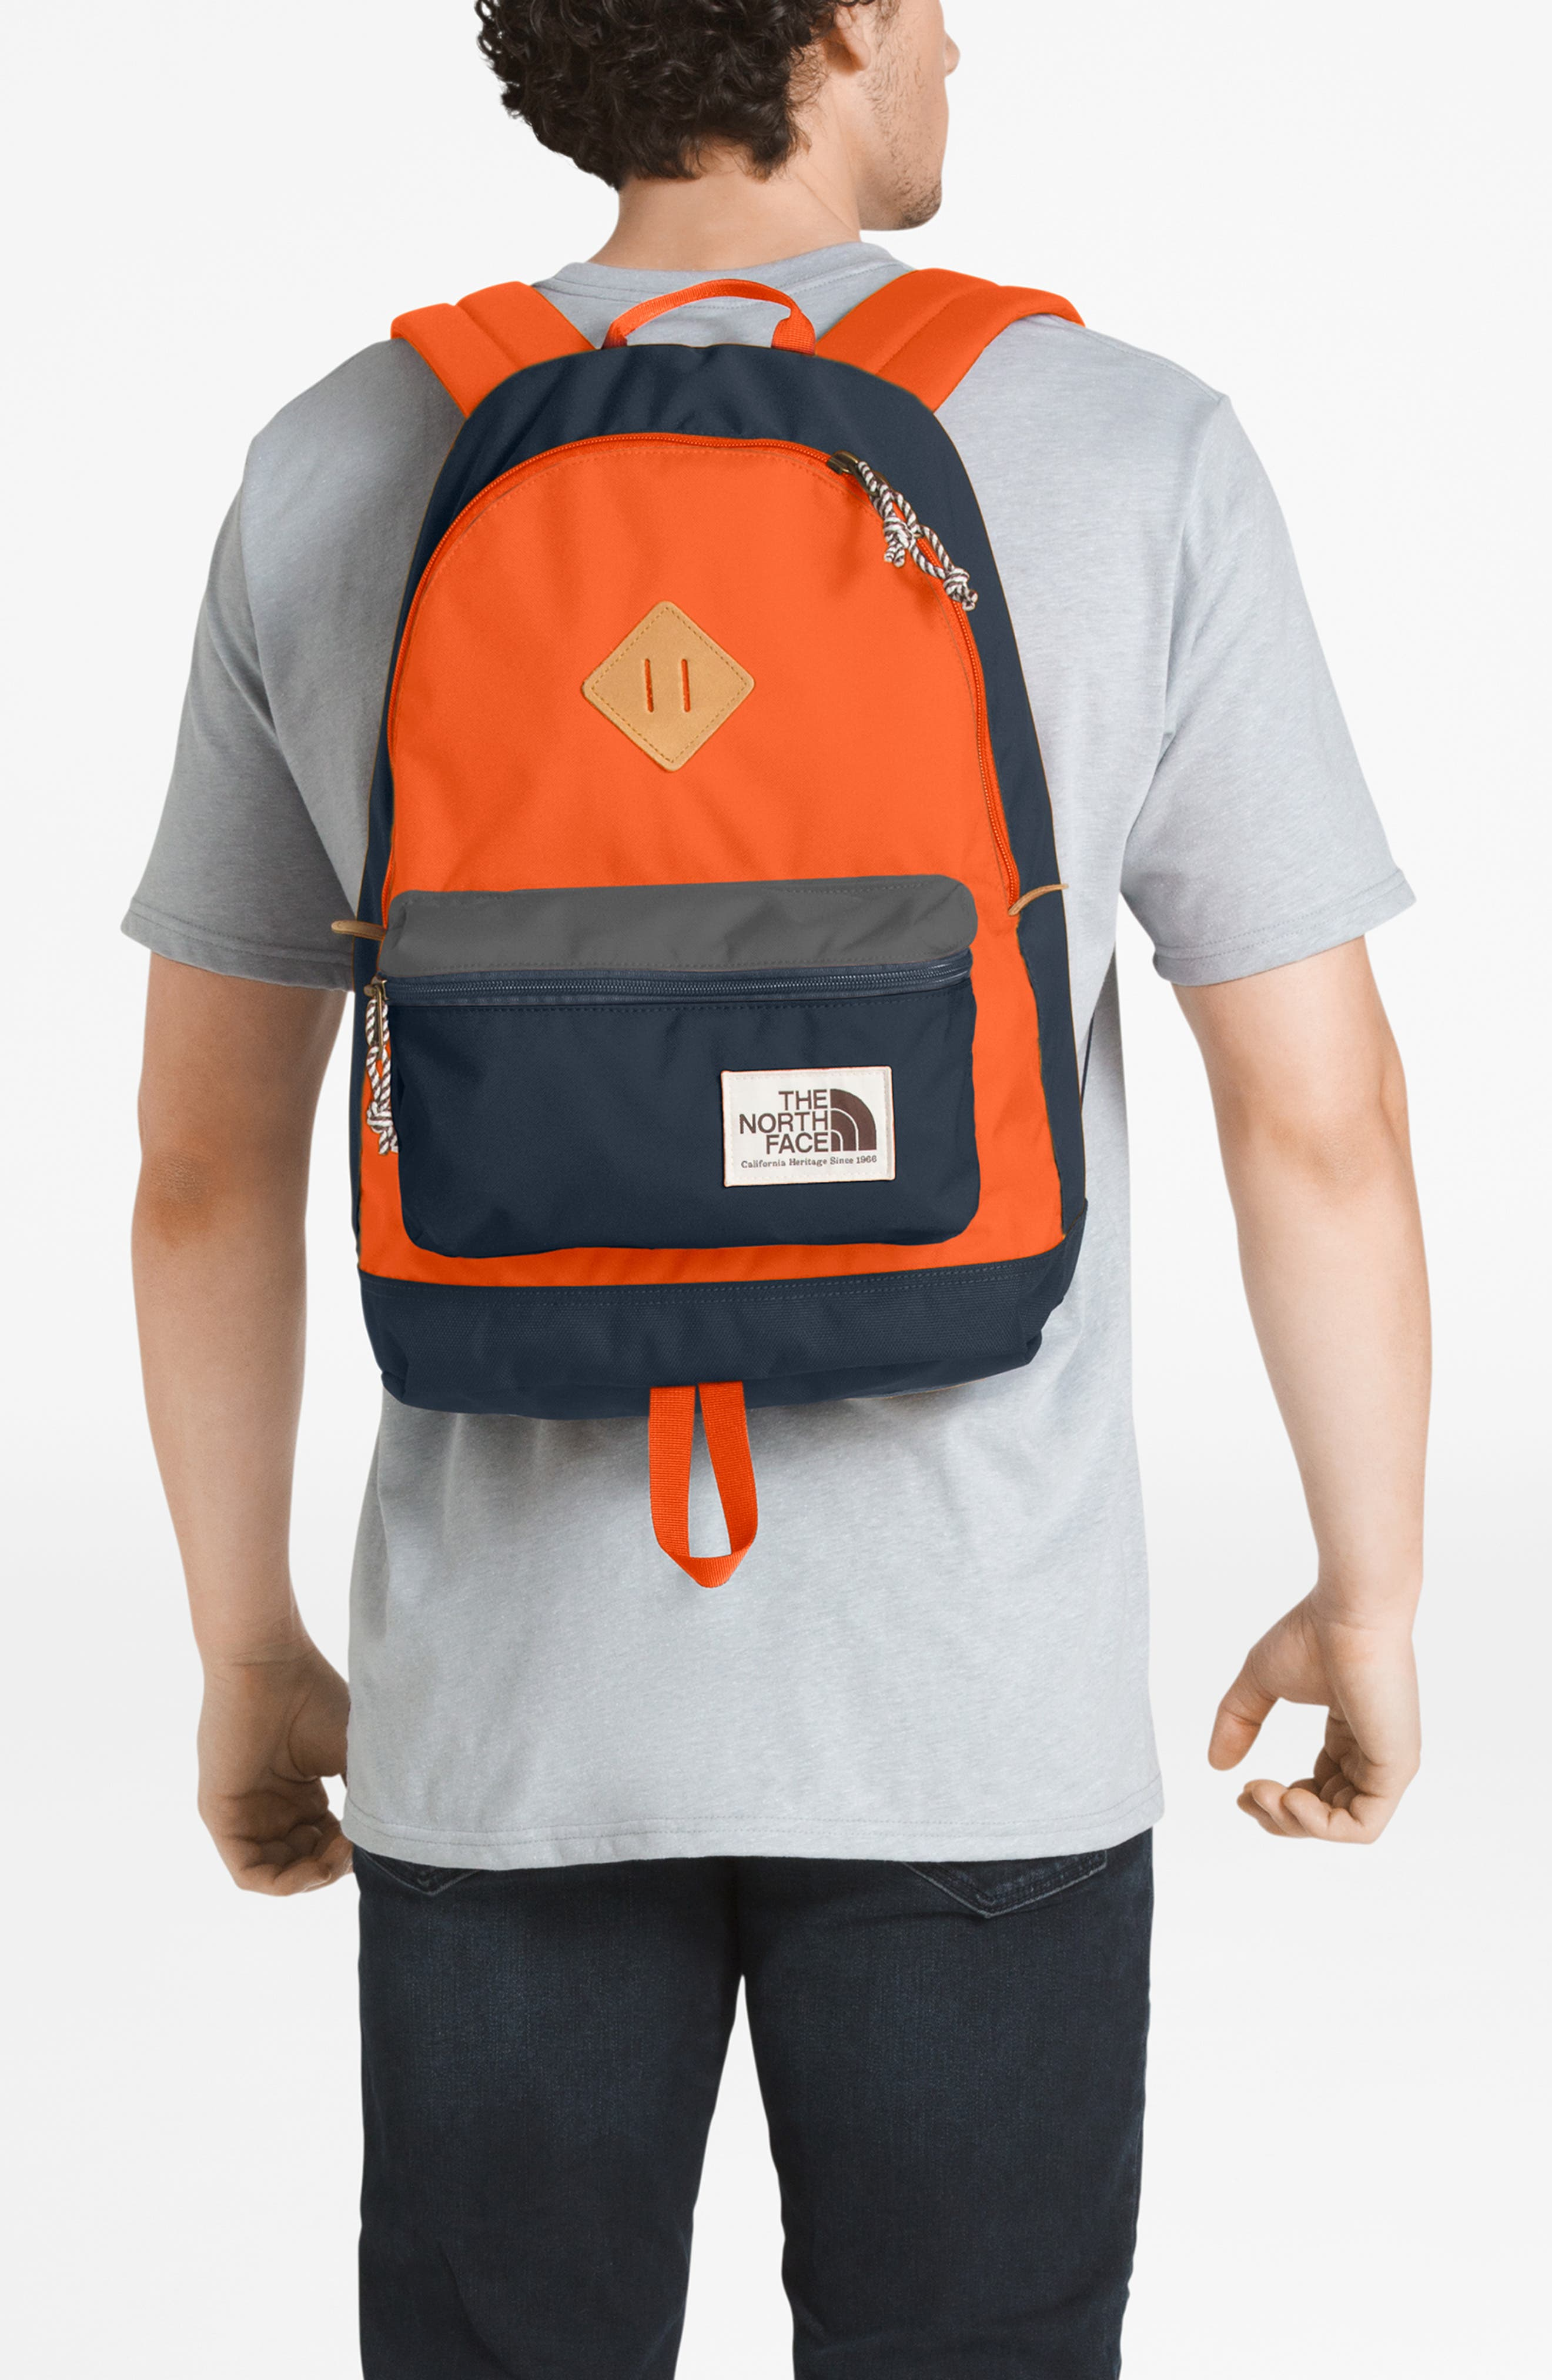 THE NORTH FACE Berkeley 25-Liter Backpack, Main, color, URBAN NAVY/PERSIAN ORANGE